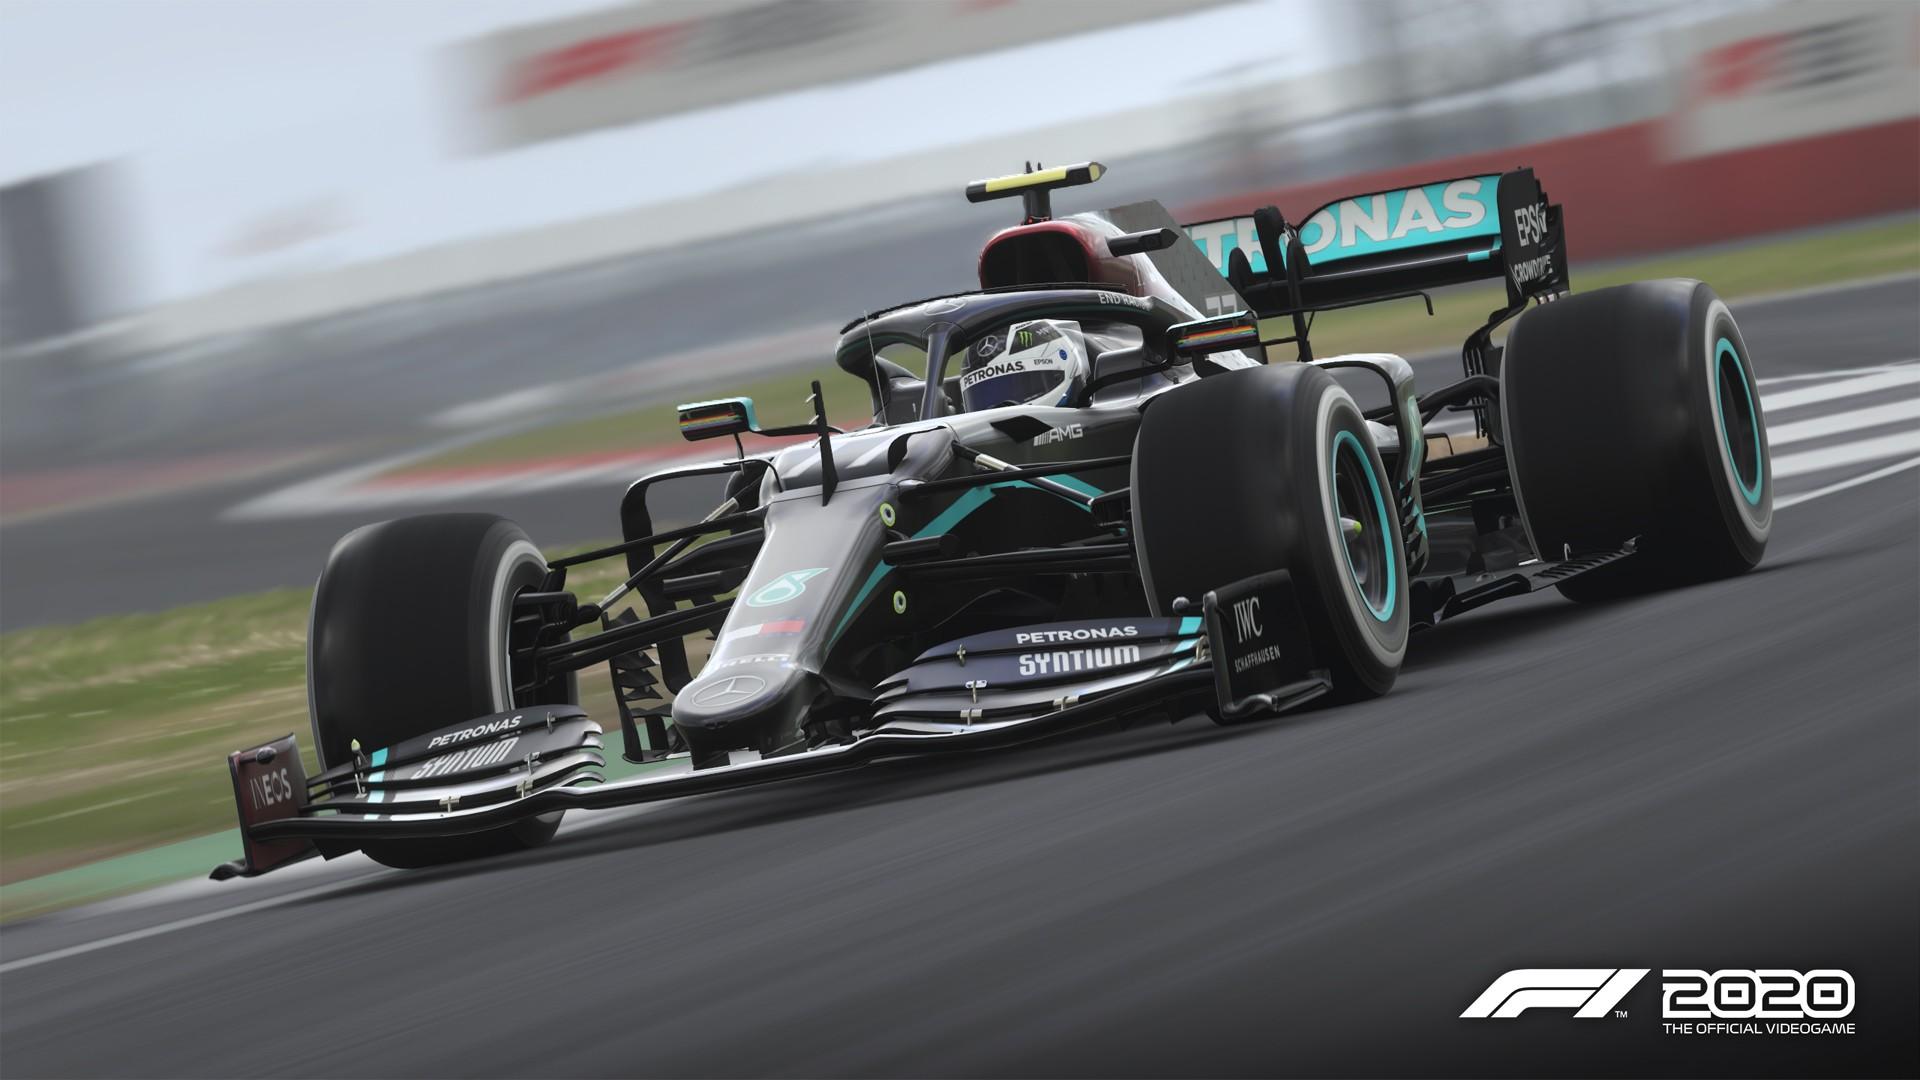 Codemasters F1 2020 screenshot - Mercedes end racism livery